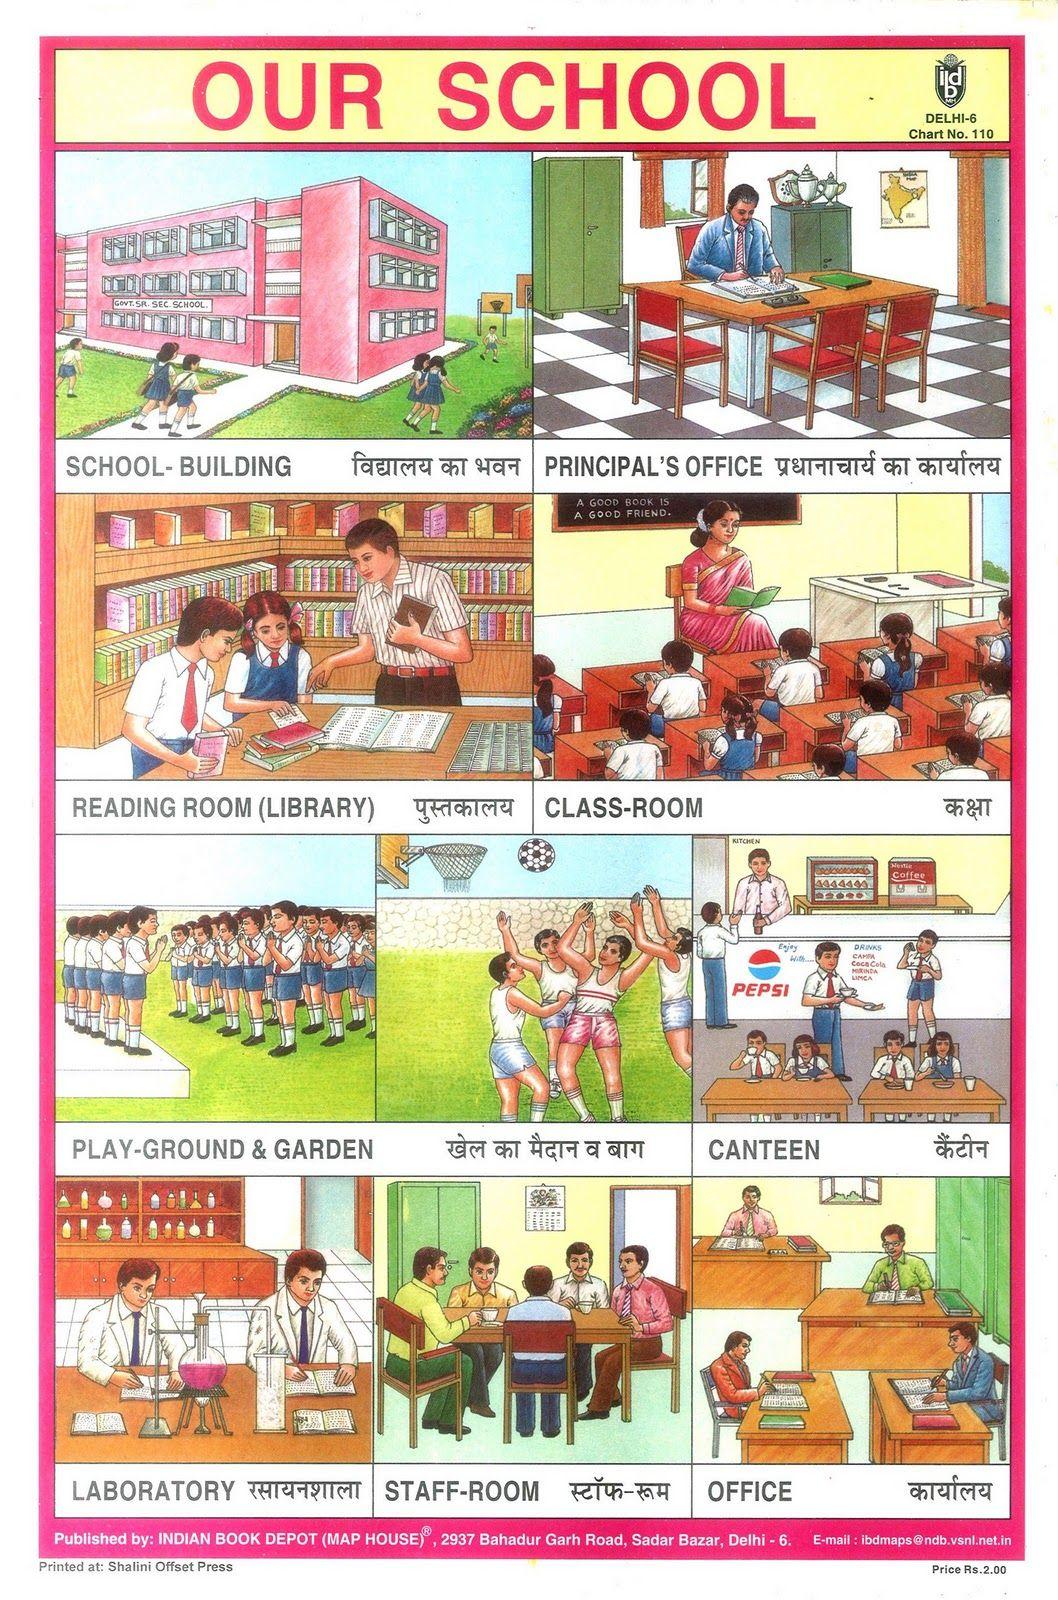 Indian school posters School posters, School, School